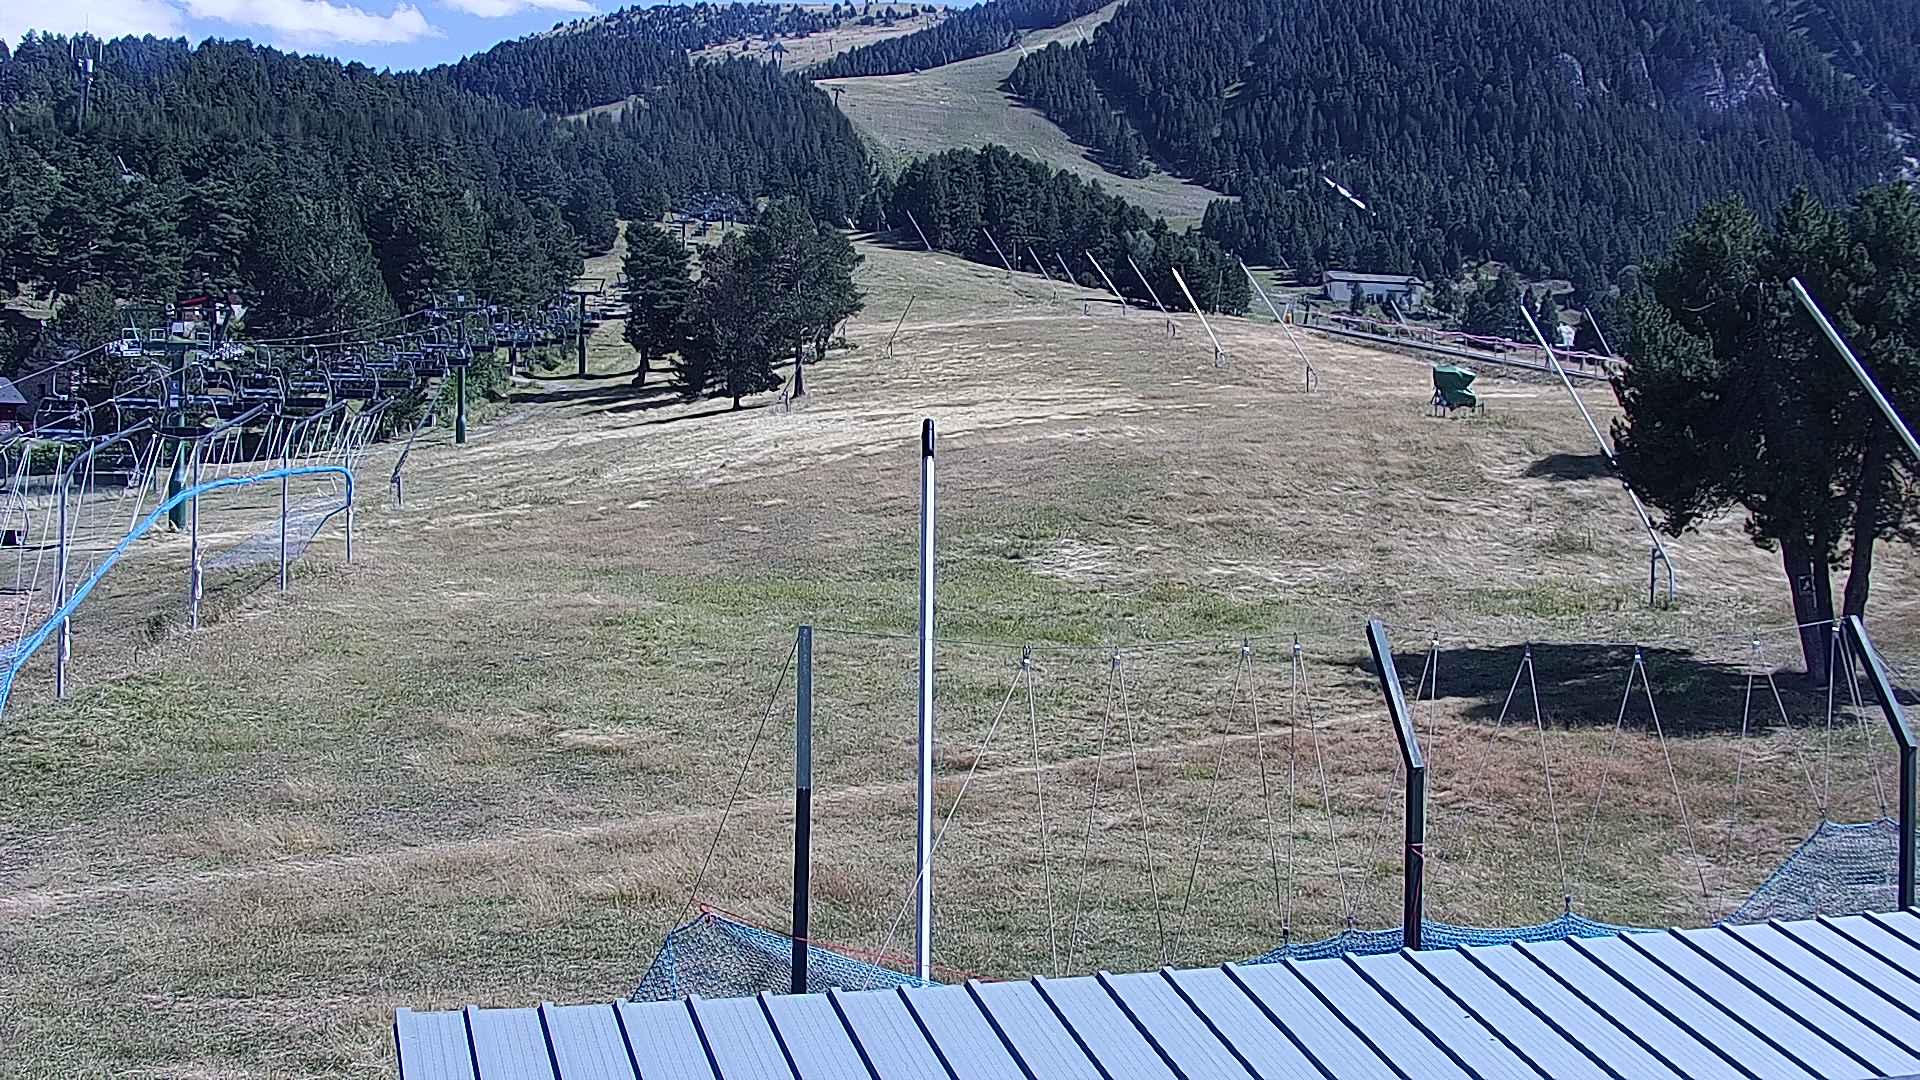 Webcam en Pista Llarga - Base